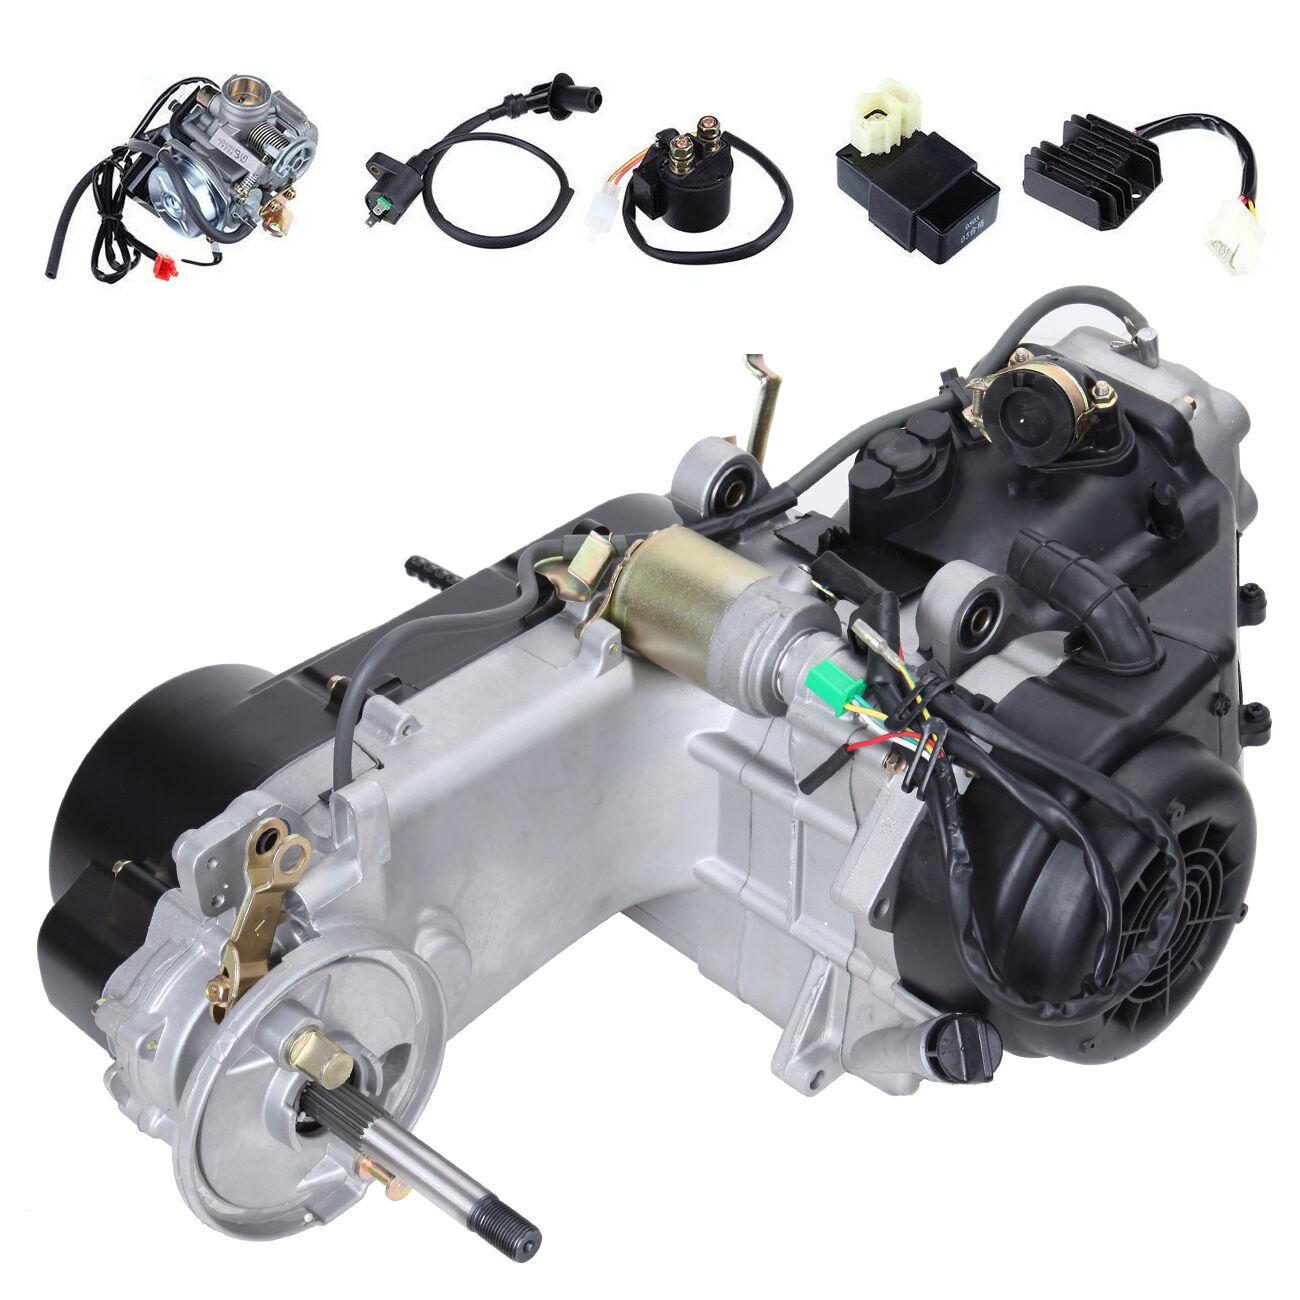 150CC Scooter ATV Go Kart Motor GY6 4 Stroke Engine Air ...